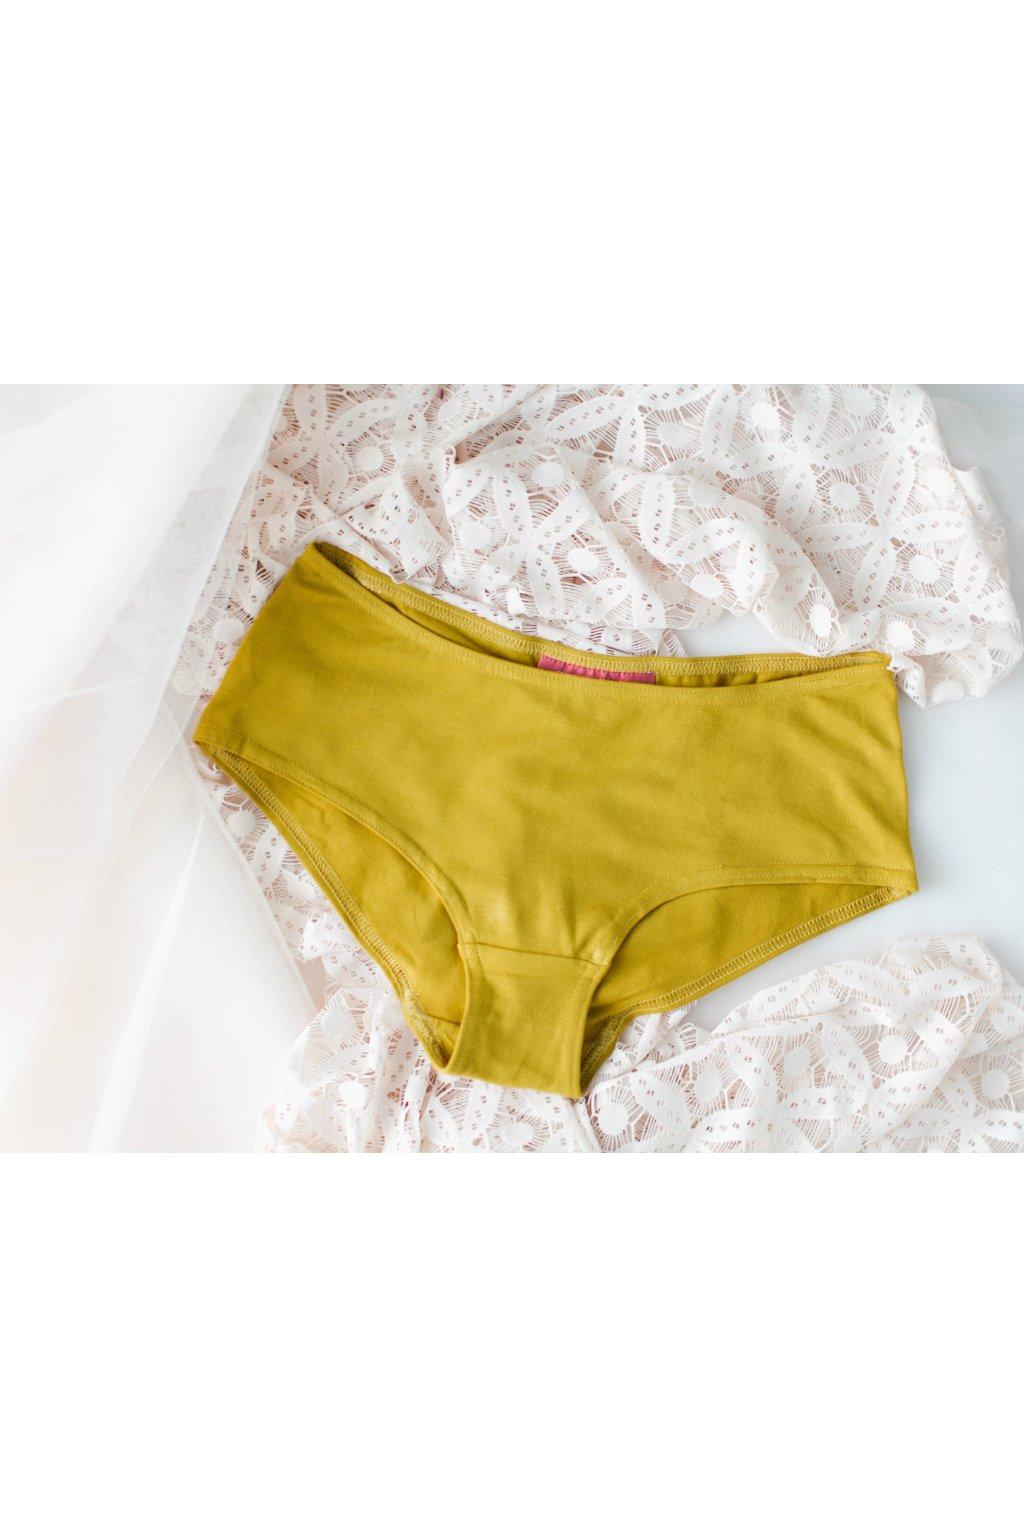 Reparada kalhotky, hořčice